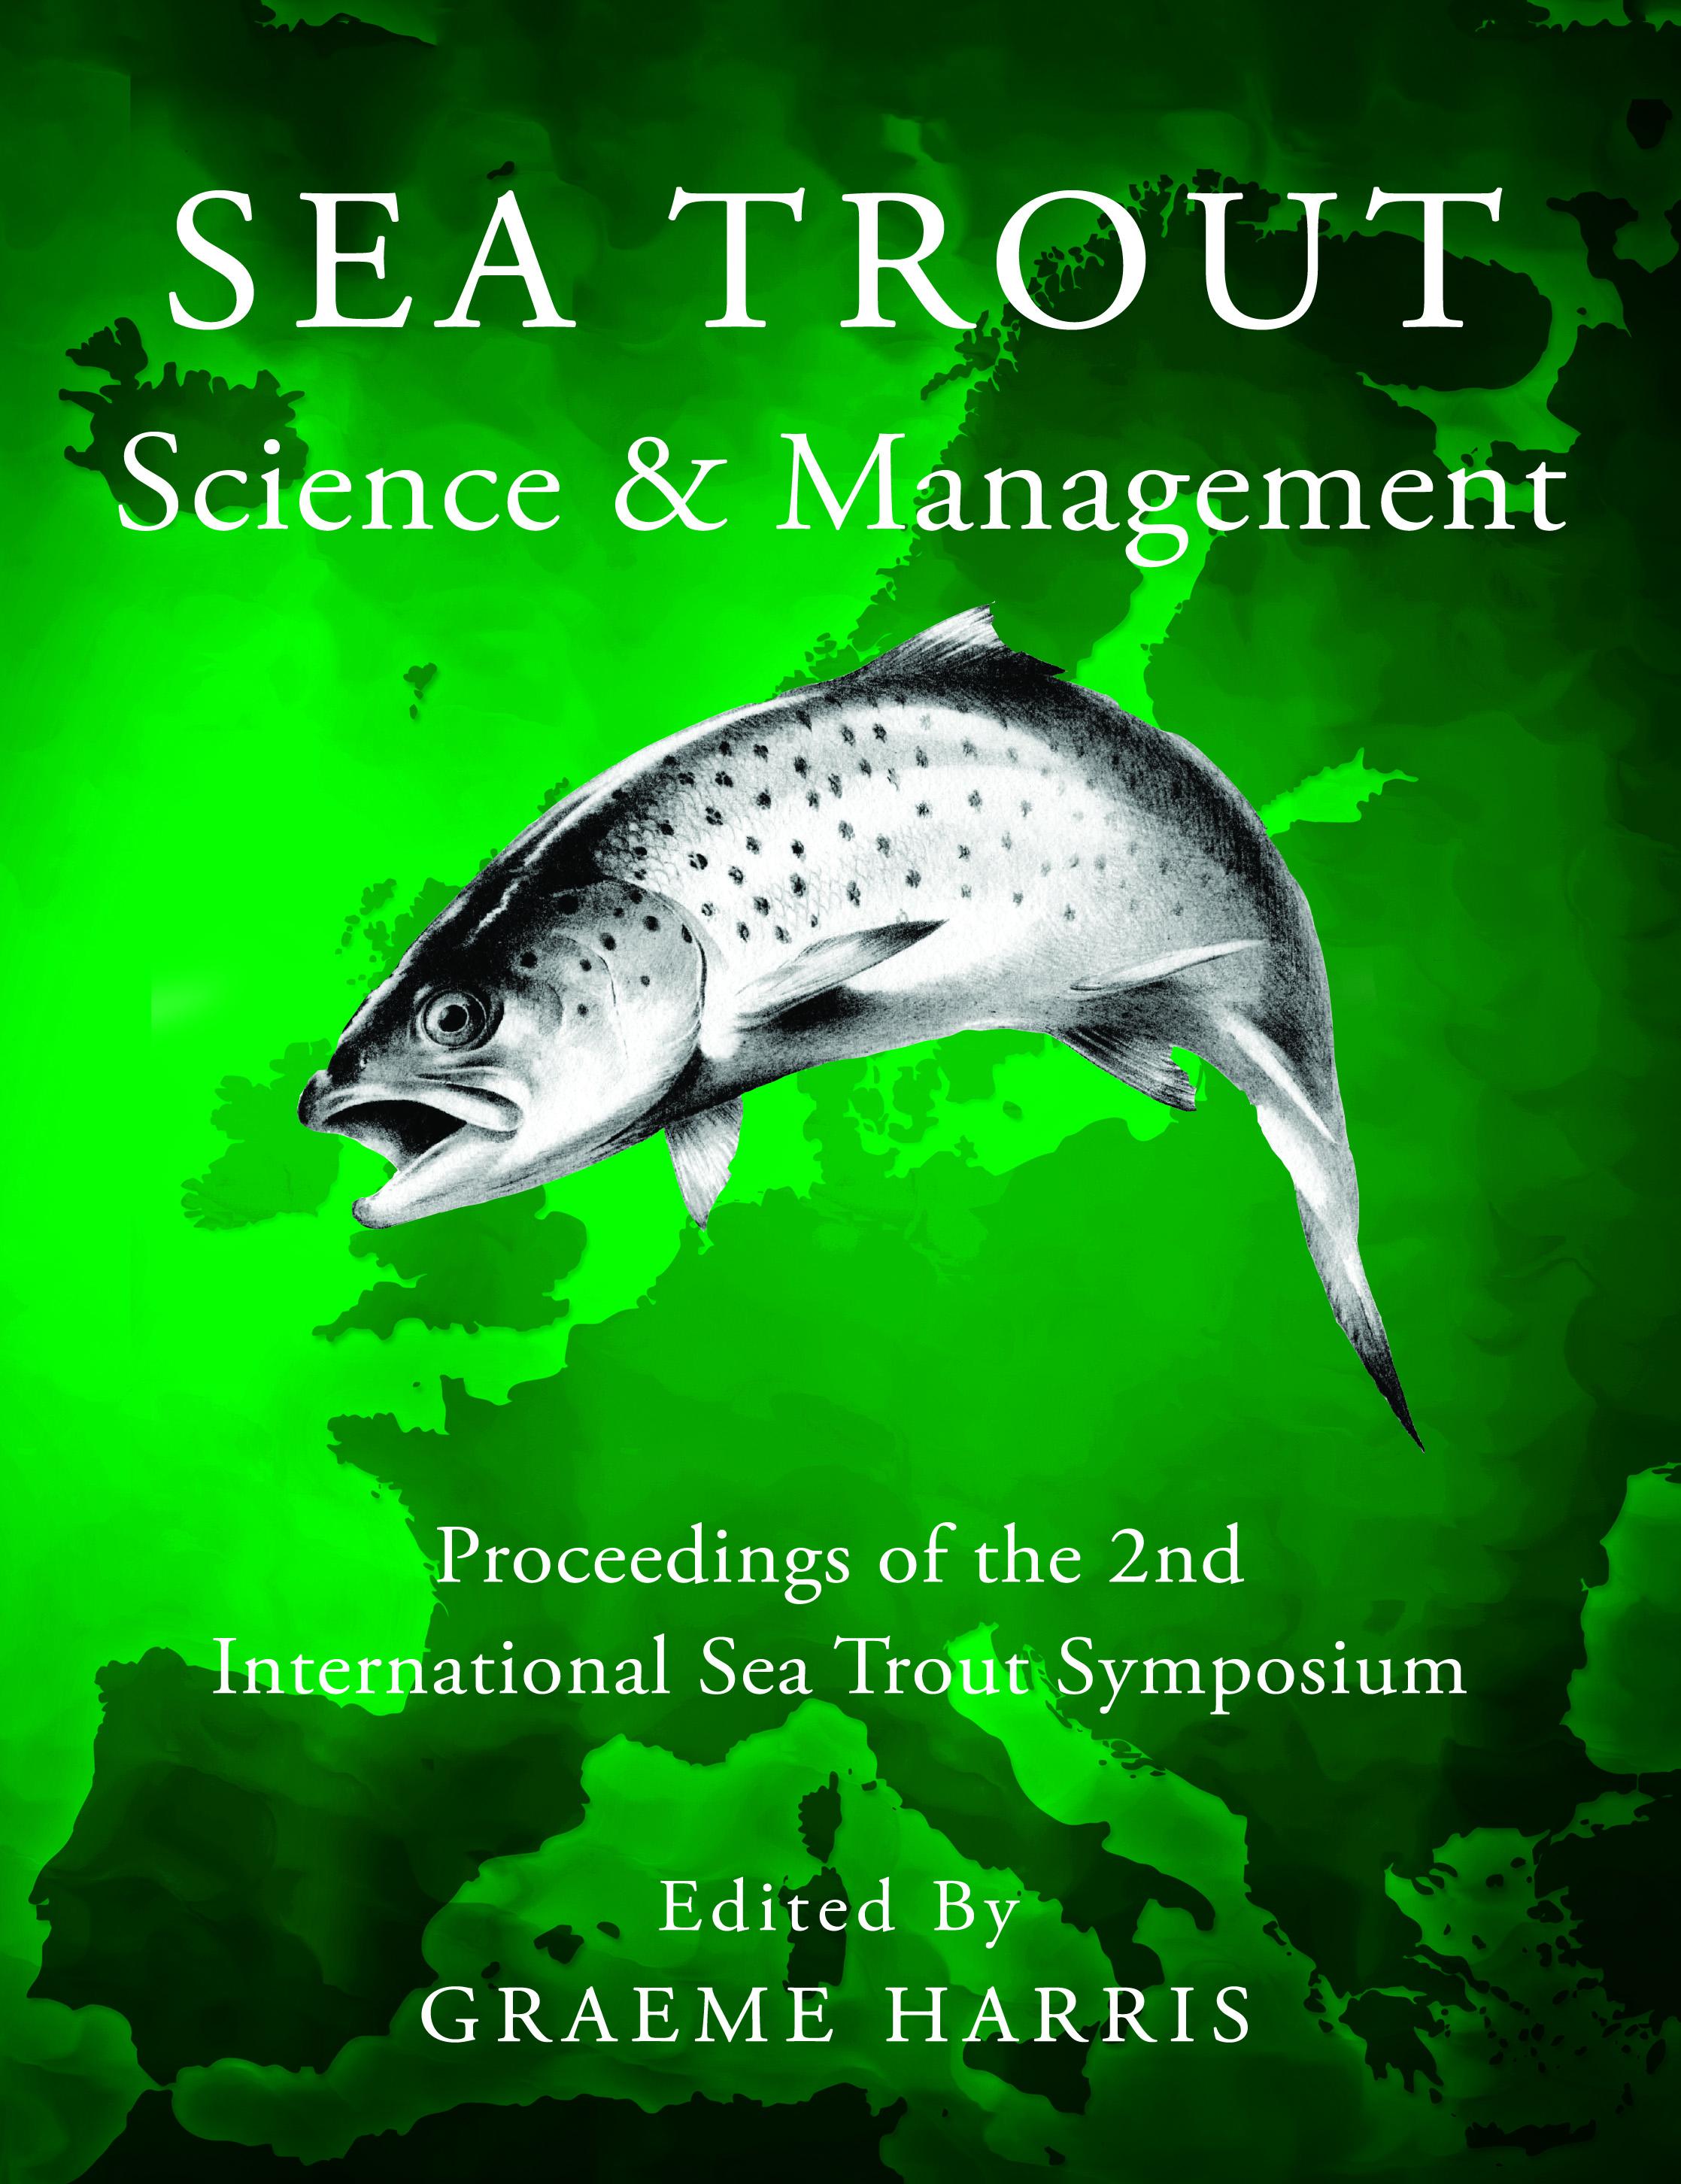 2nd International Sea Trout Symposium